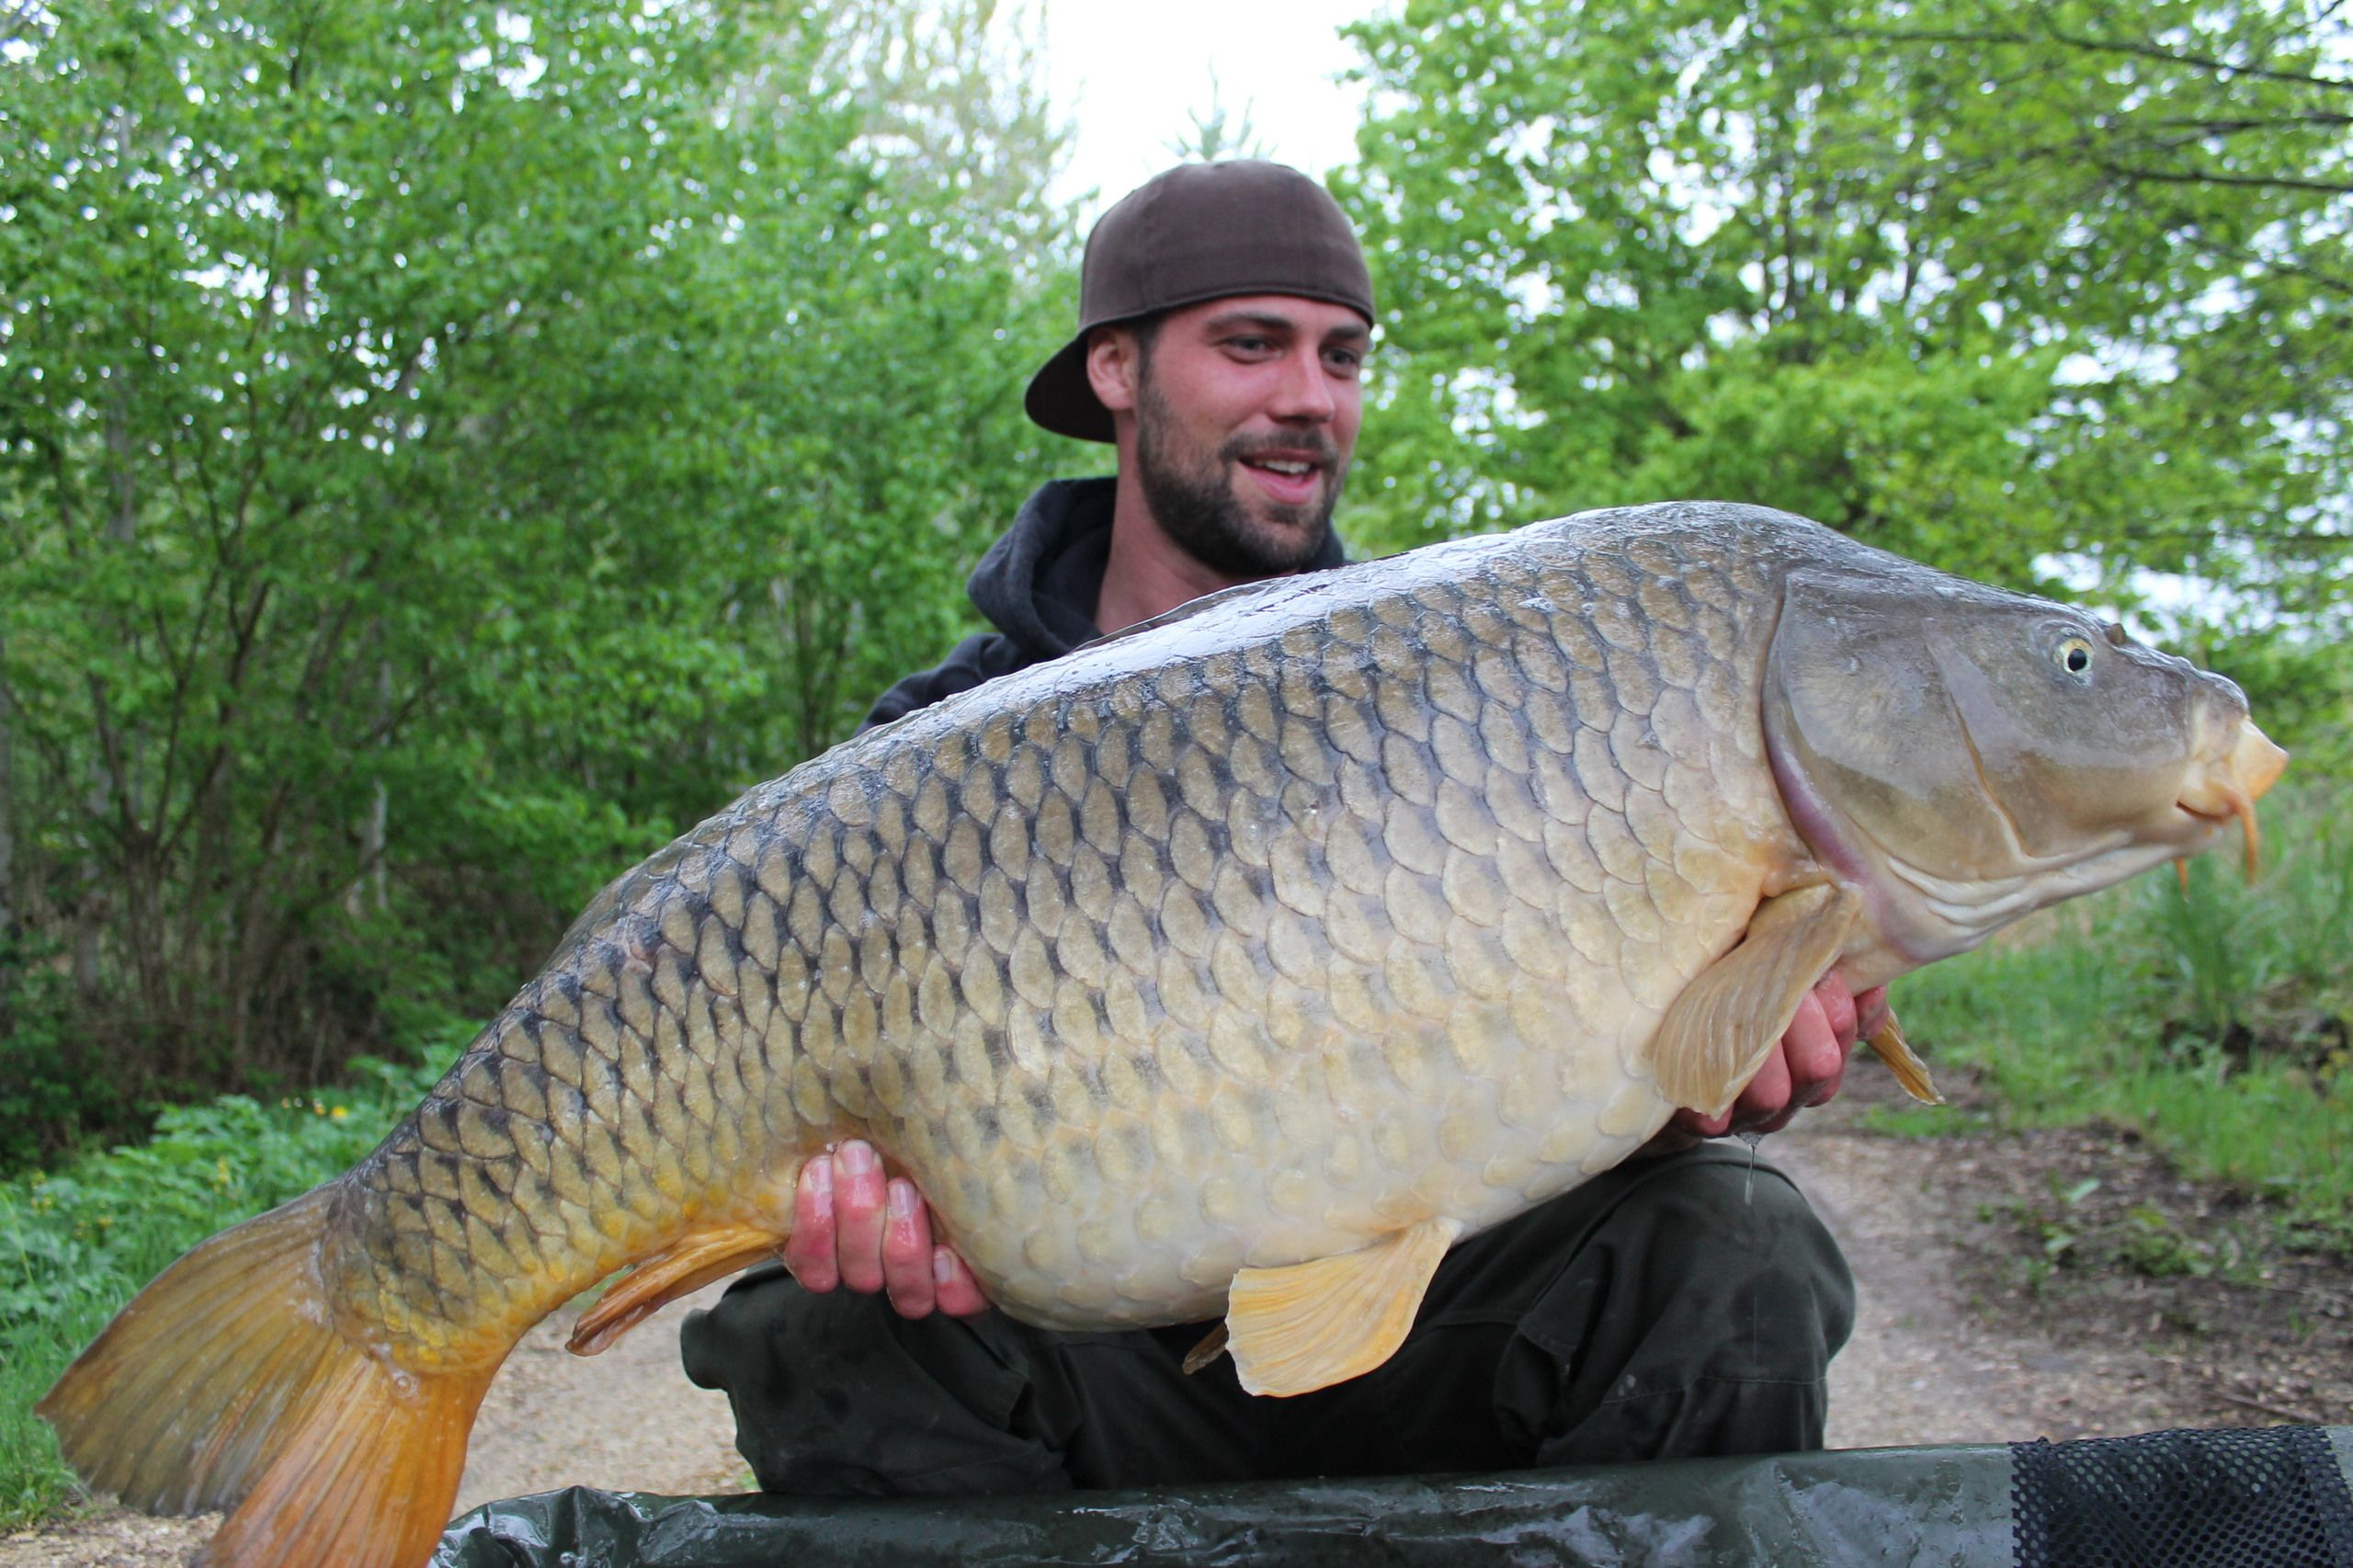 Carp Fishing Holidays In France Vissen Karpervissen Karper